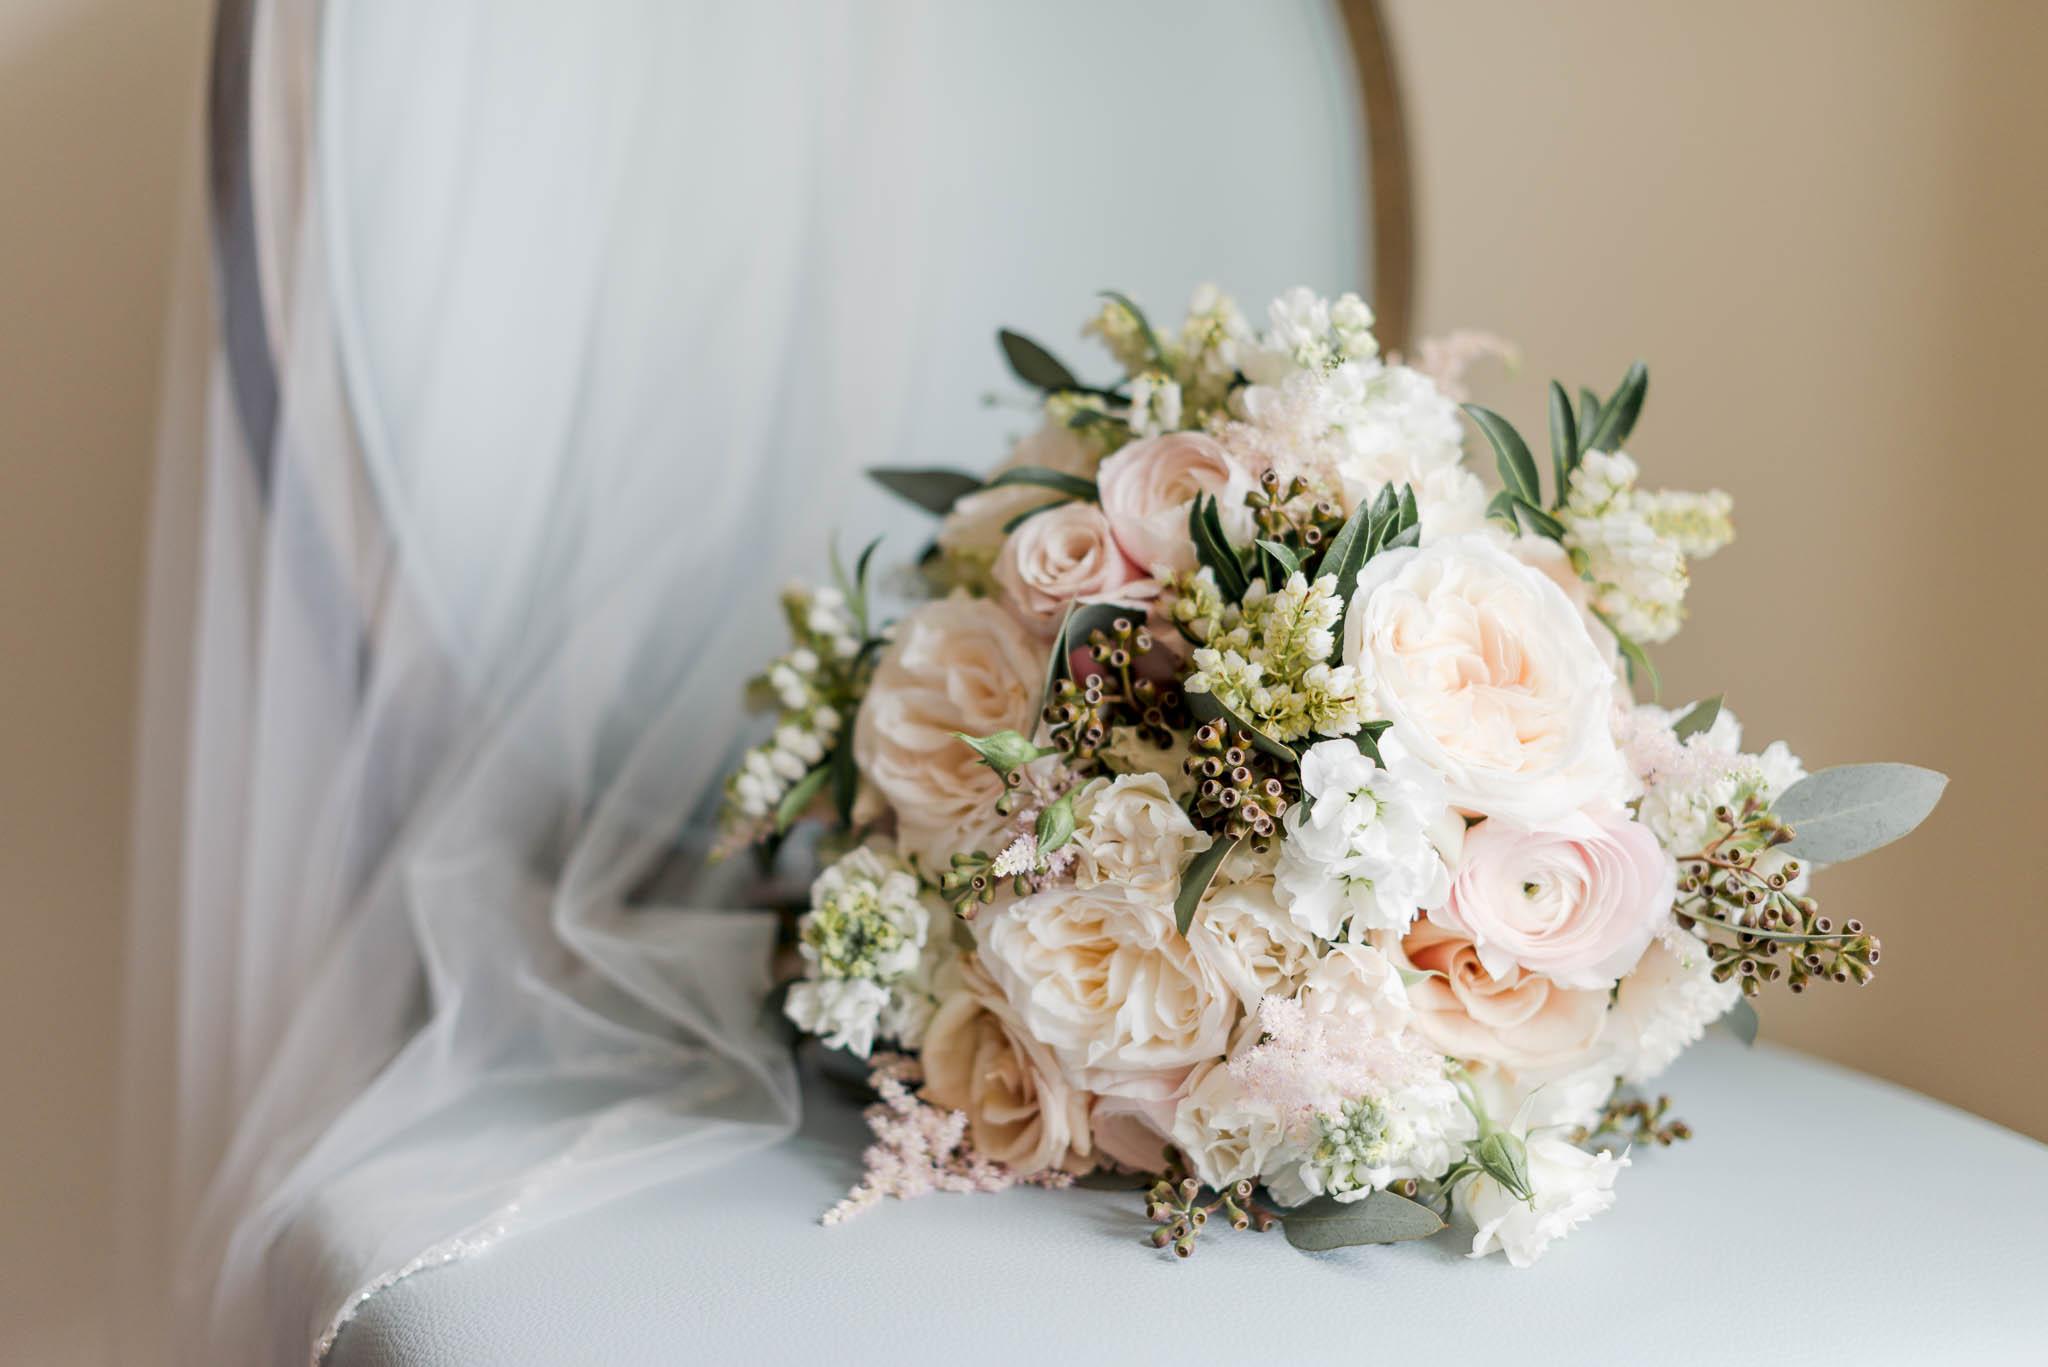 Kirsten-Smith-Photography-Kelly-Steven-Wedding-41.jpg